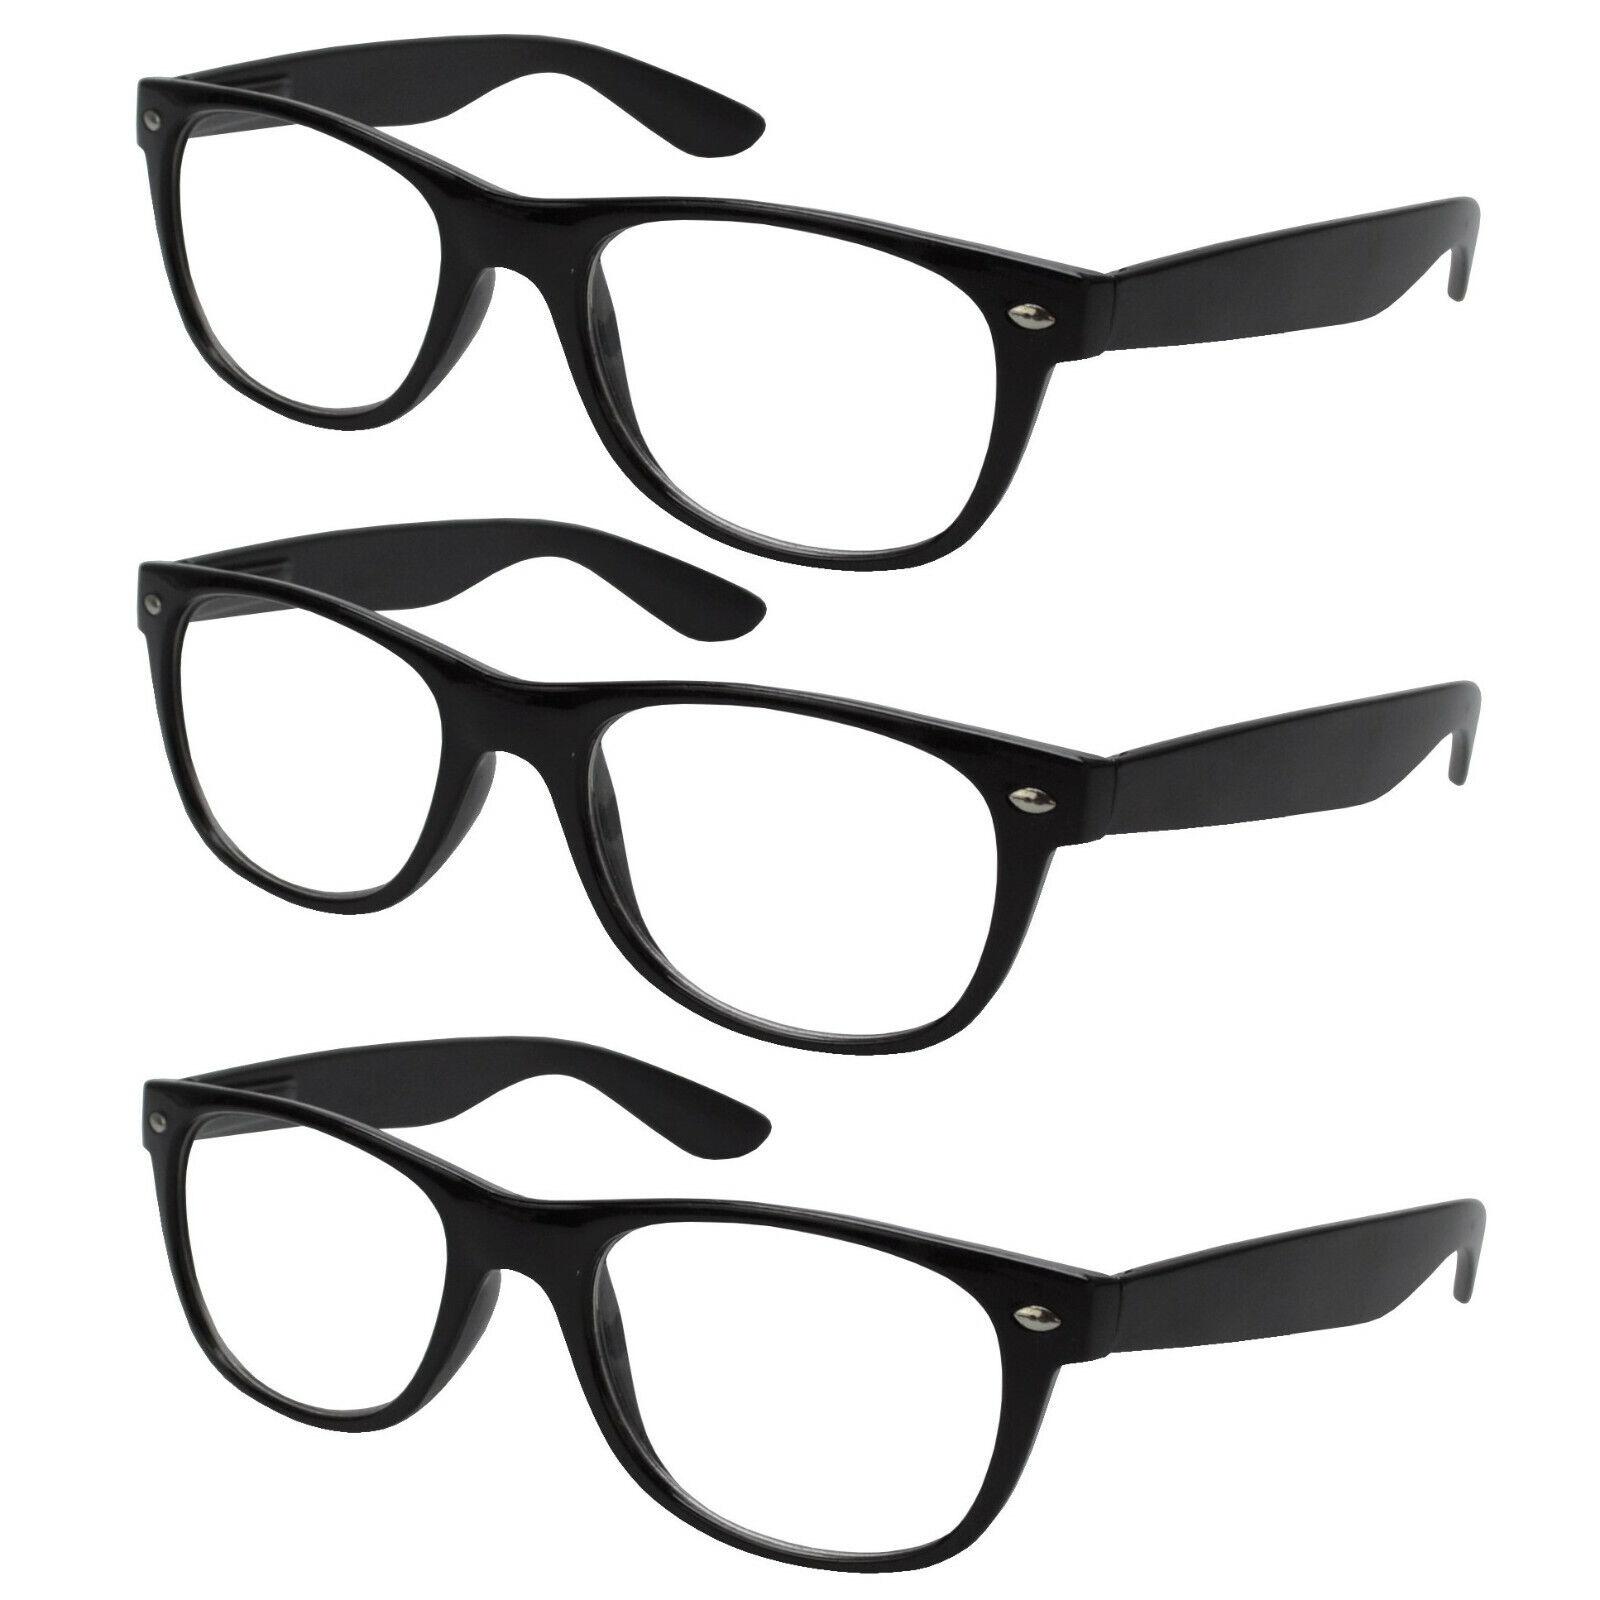 3x Lesebrille schwarz Lesehilfe Sehhilfe Kunststoff Brille Vollrahmen 1,0 4,0